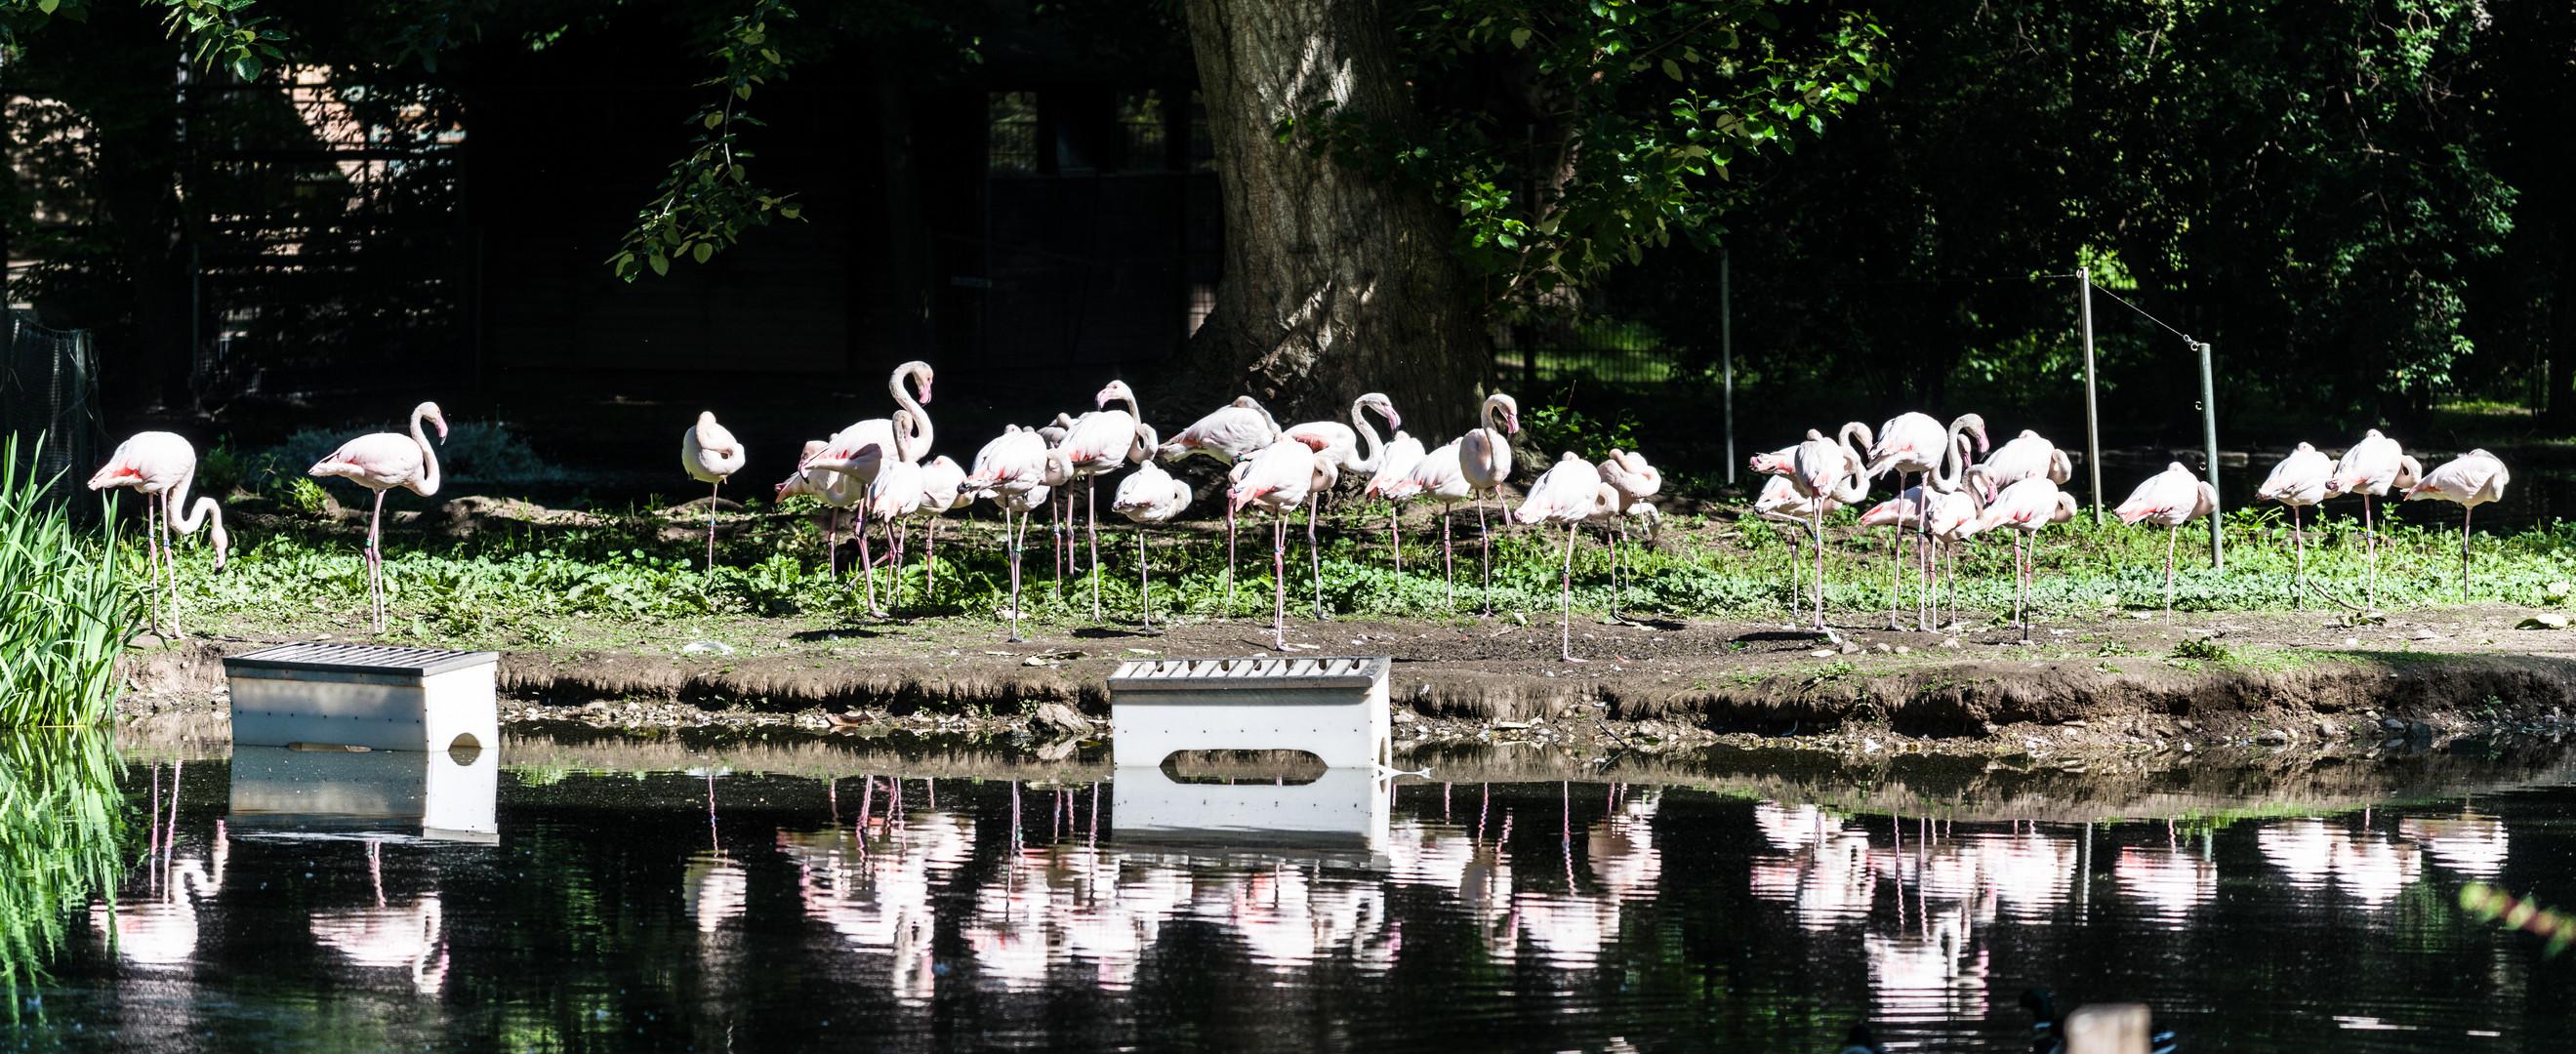 Zoo Köln - Flamingos